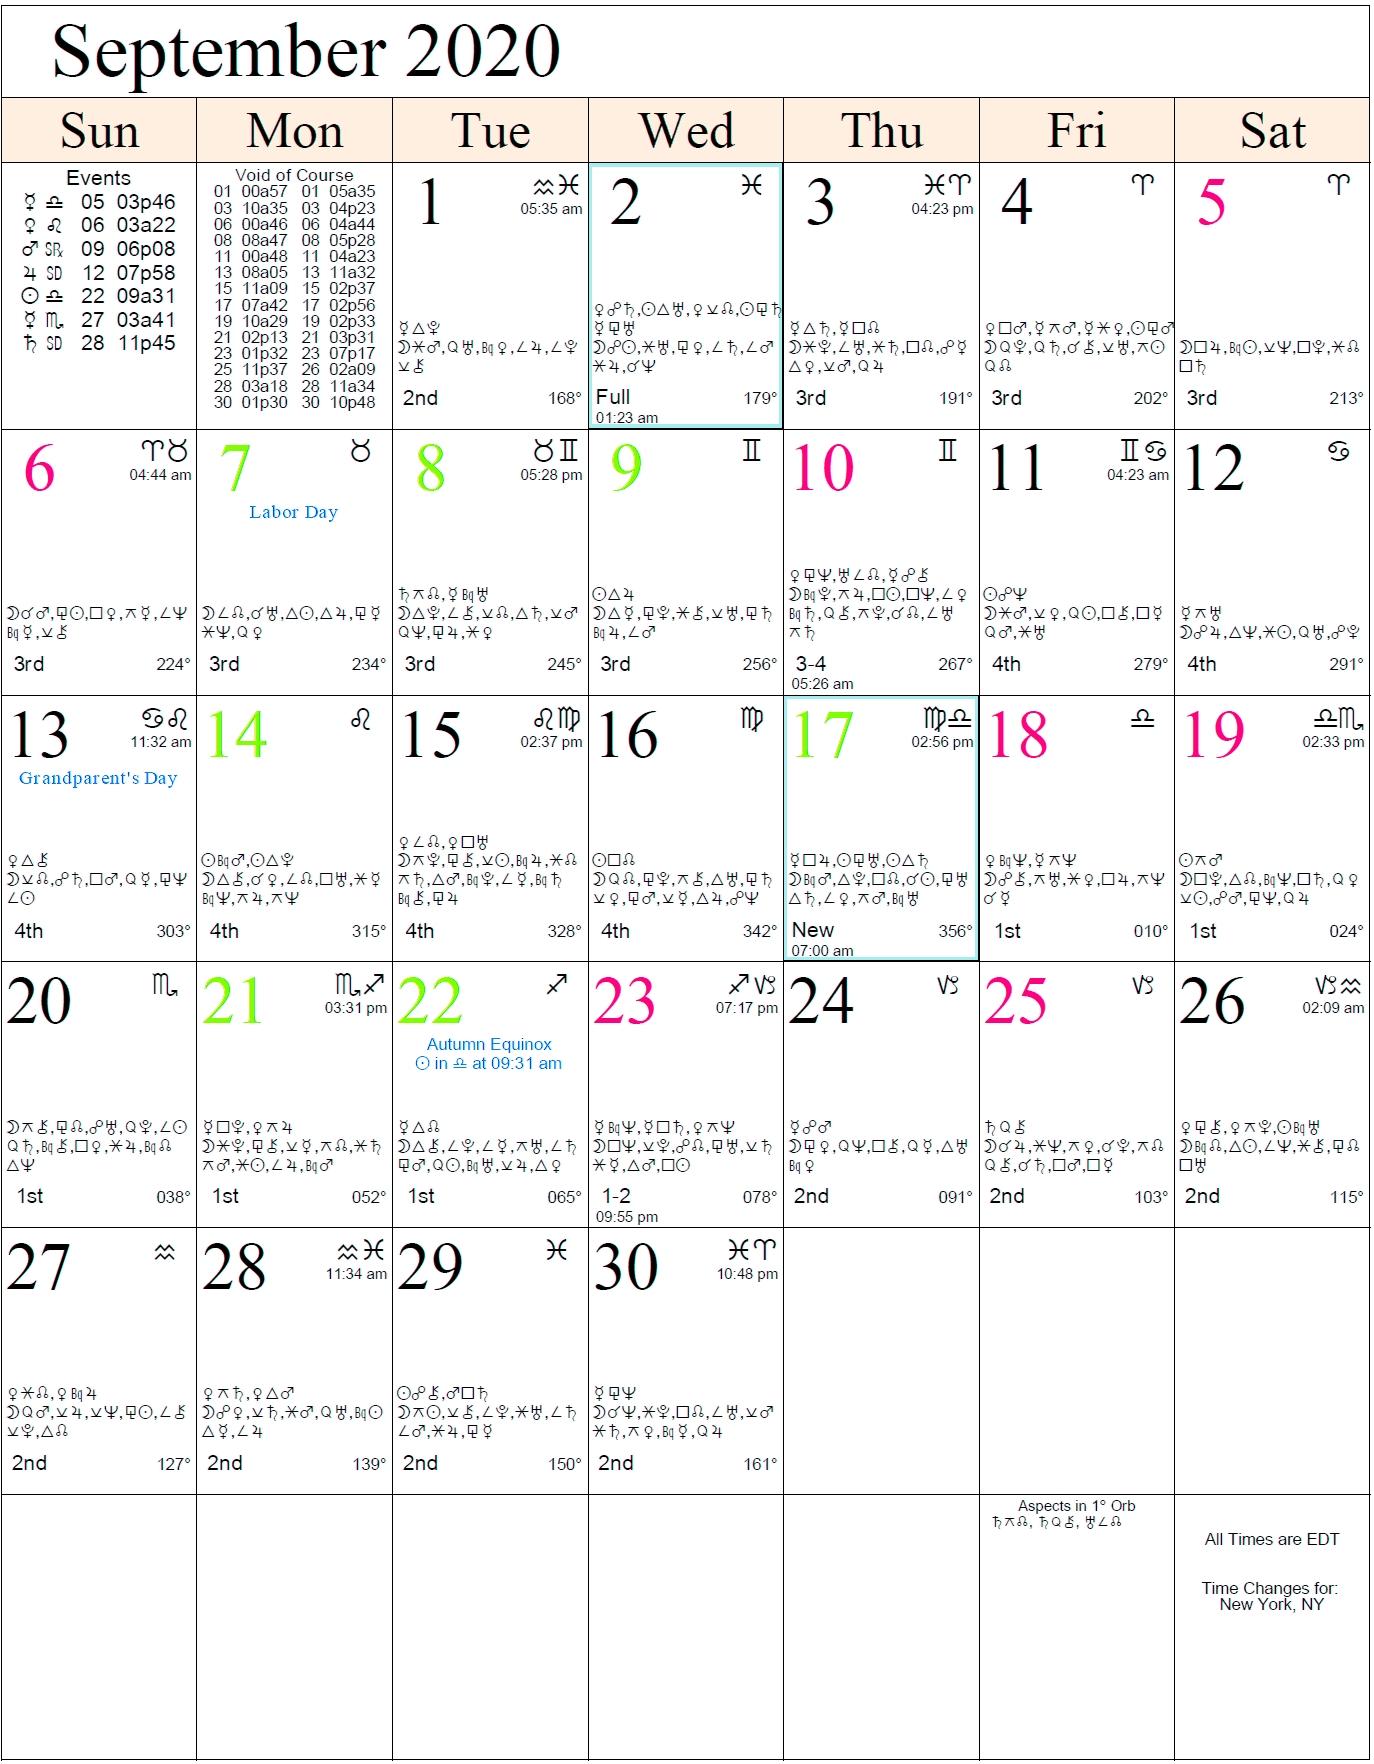 February 2021 Astrology Signs Calendar | Calendar 2021